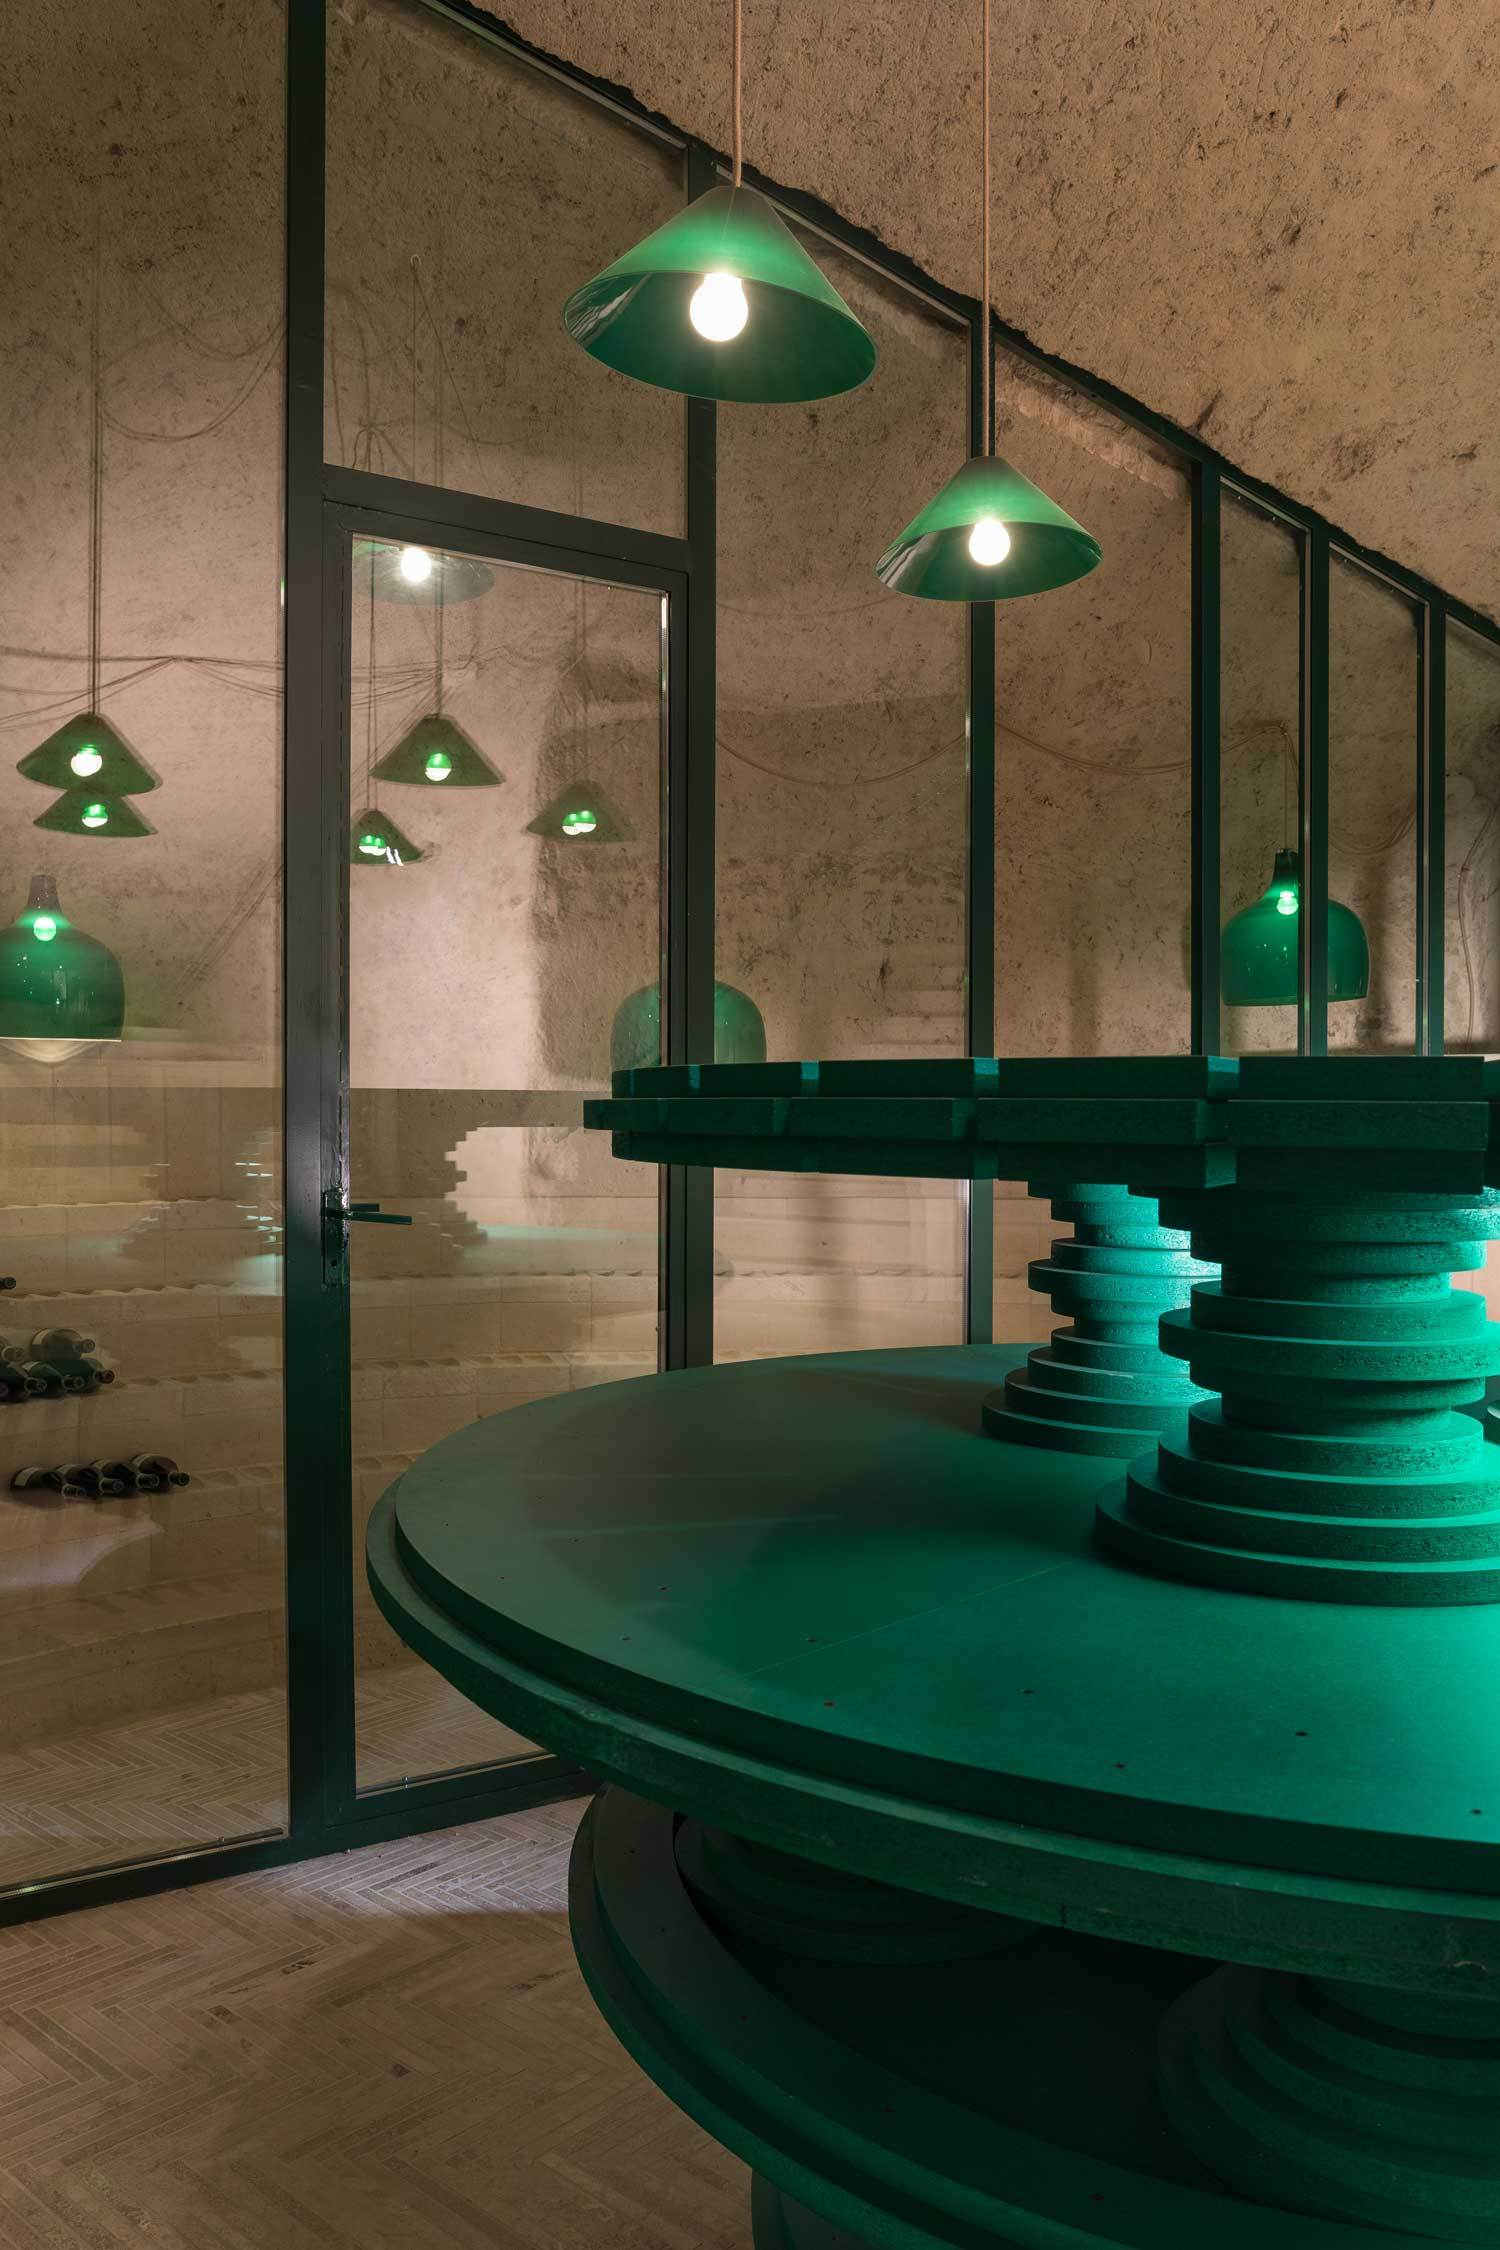 Enoteca-dai-Tosi-Wine-Bar-in-Matera-Italy-by-Architecten-De-Vylder-Vinck-Taillieu-cafeveyafe (17)